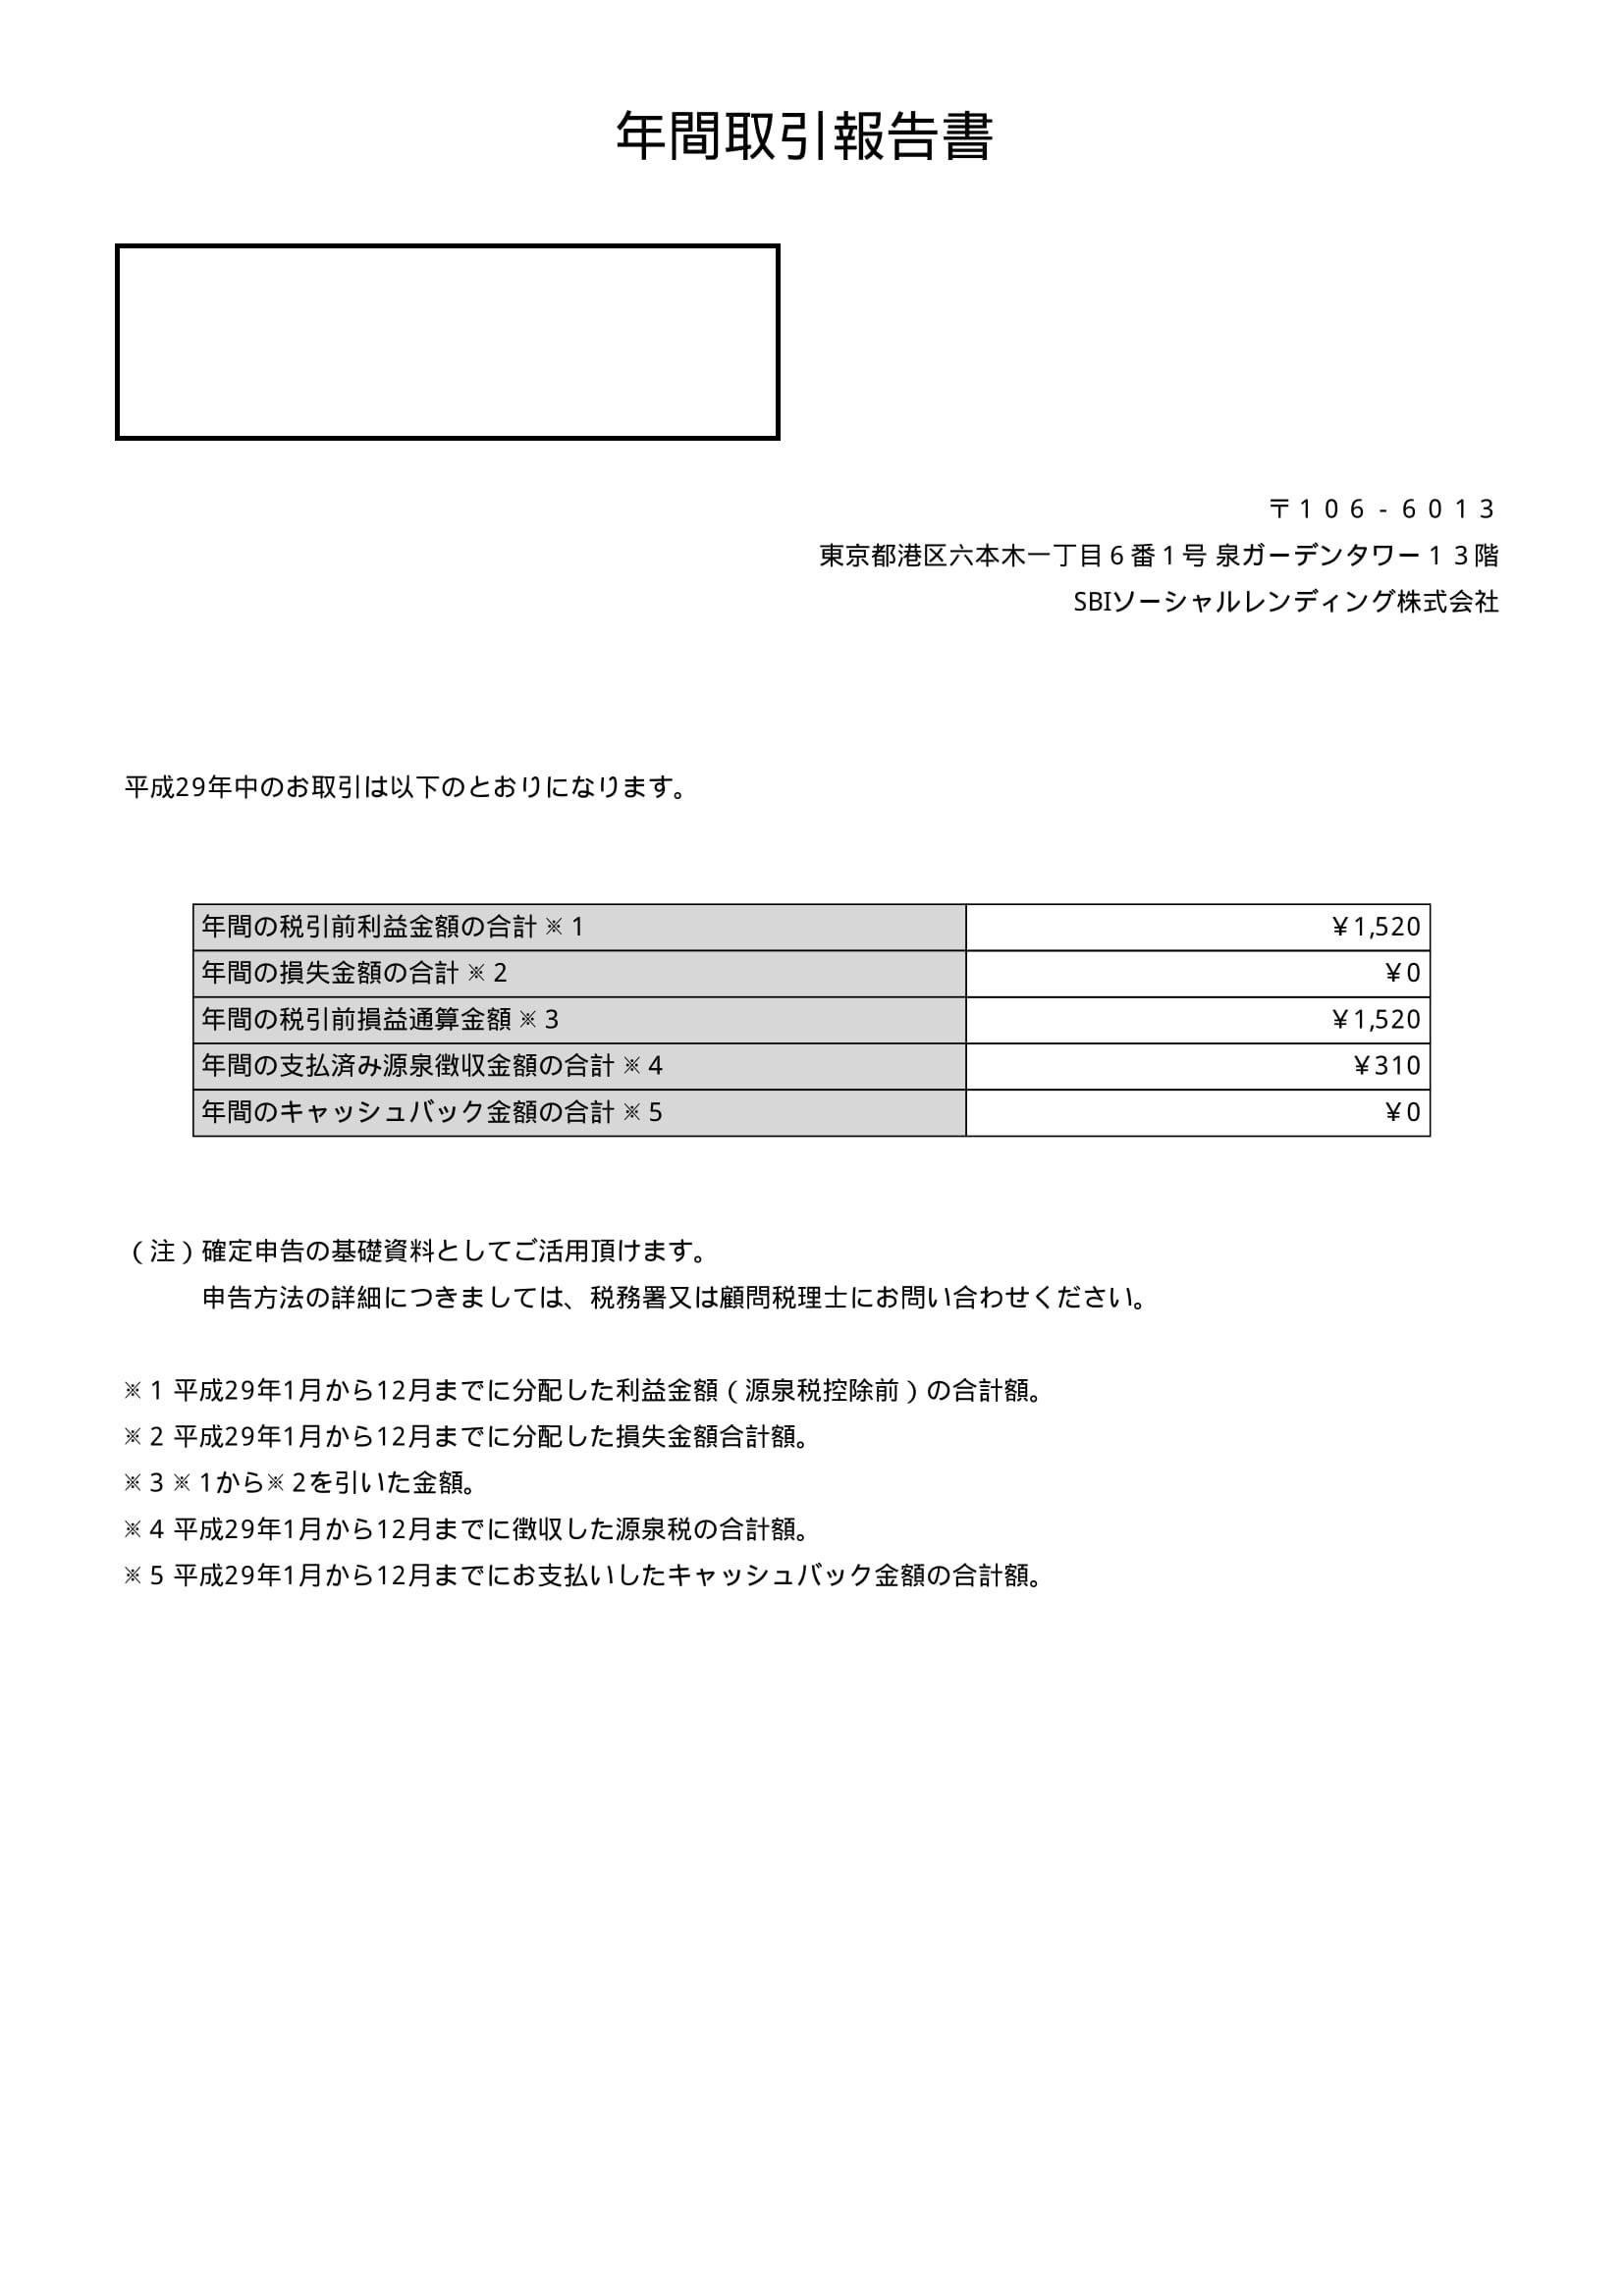 SBI年間取引報告書 (1)-1